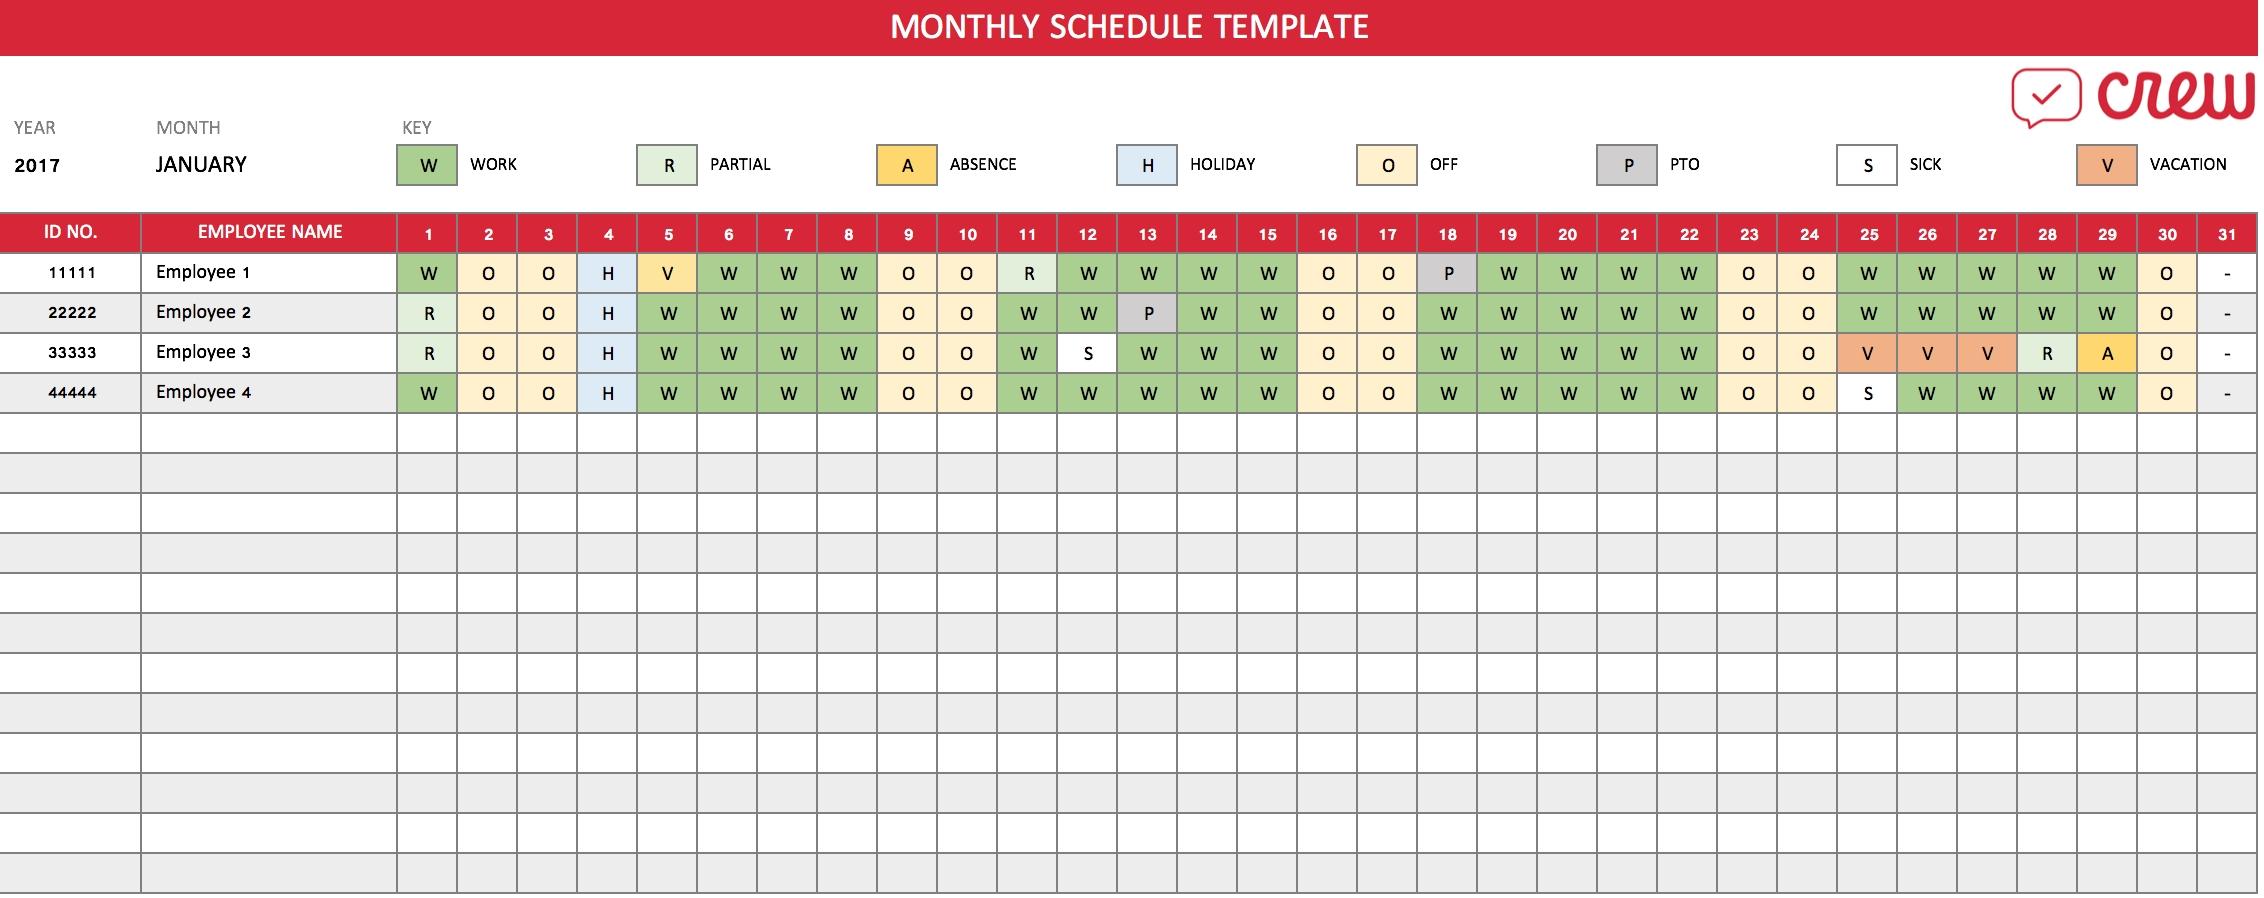 Free Monthly Work Schedule Template - Crew